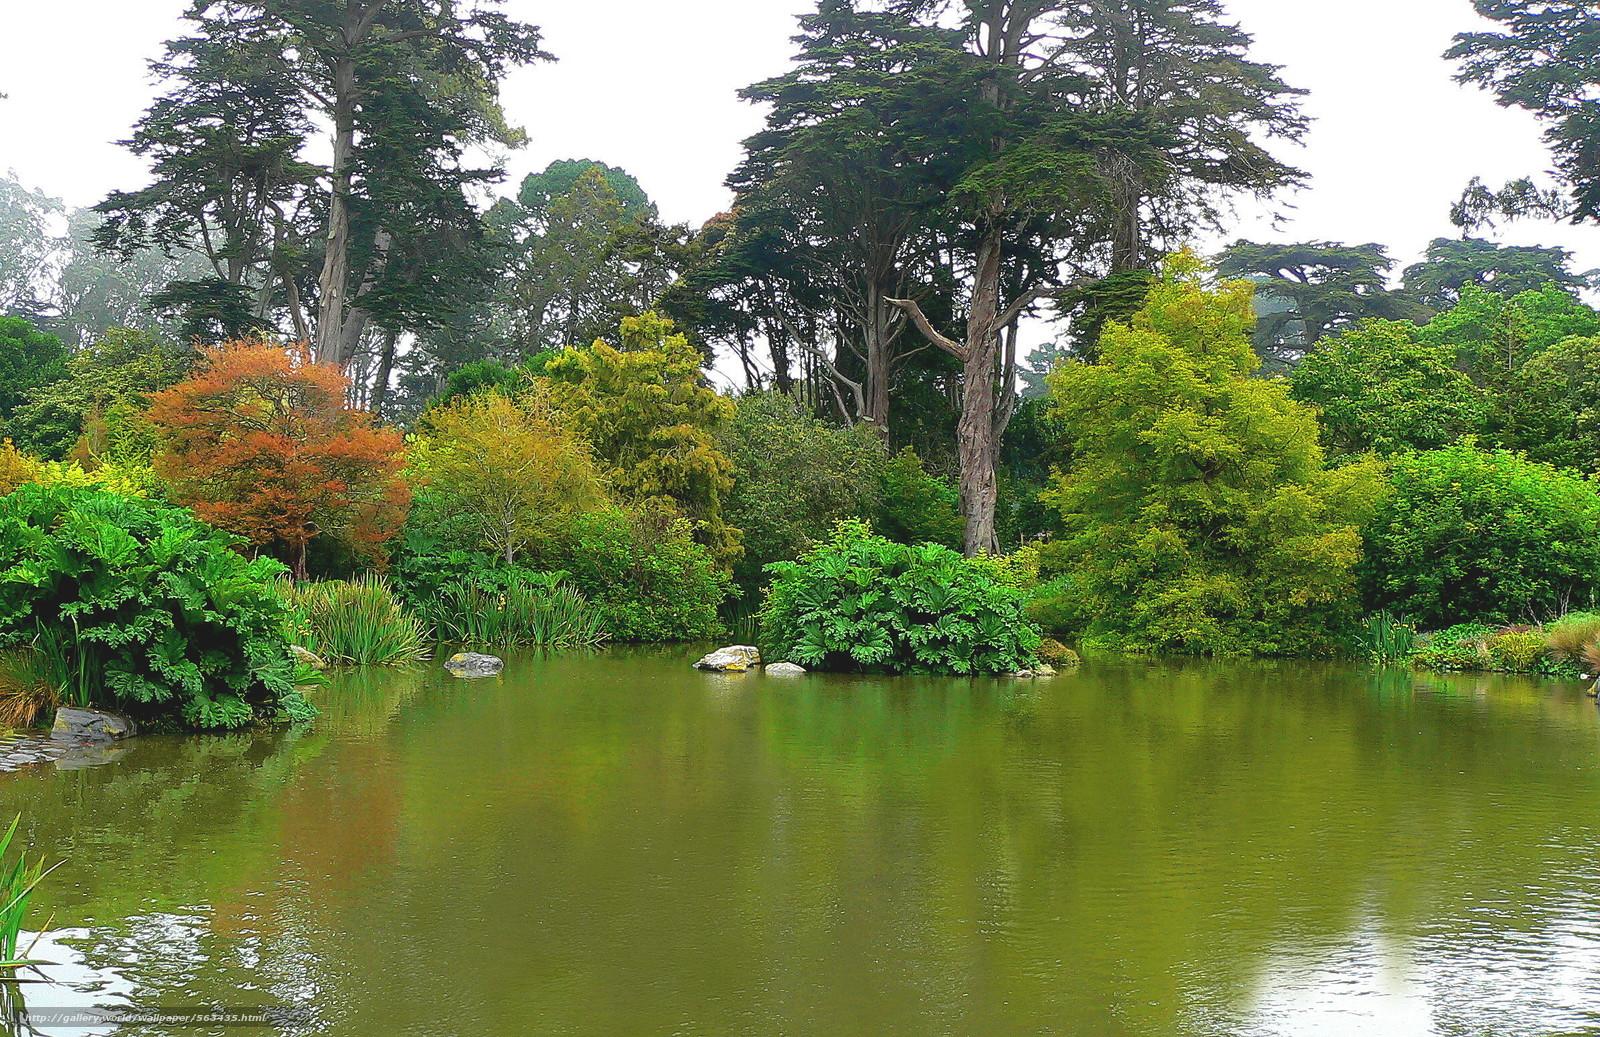 Download Wallpaper San Francisco Botanical Garden Golden Gate Park Free Desktop Wallpaper In